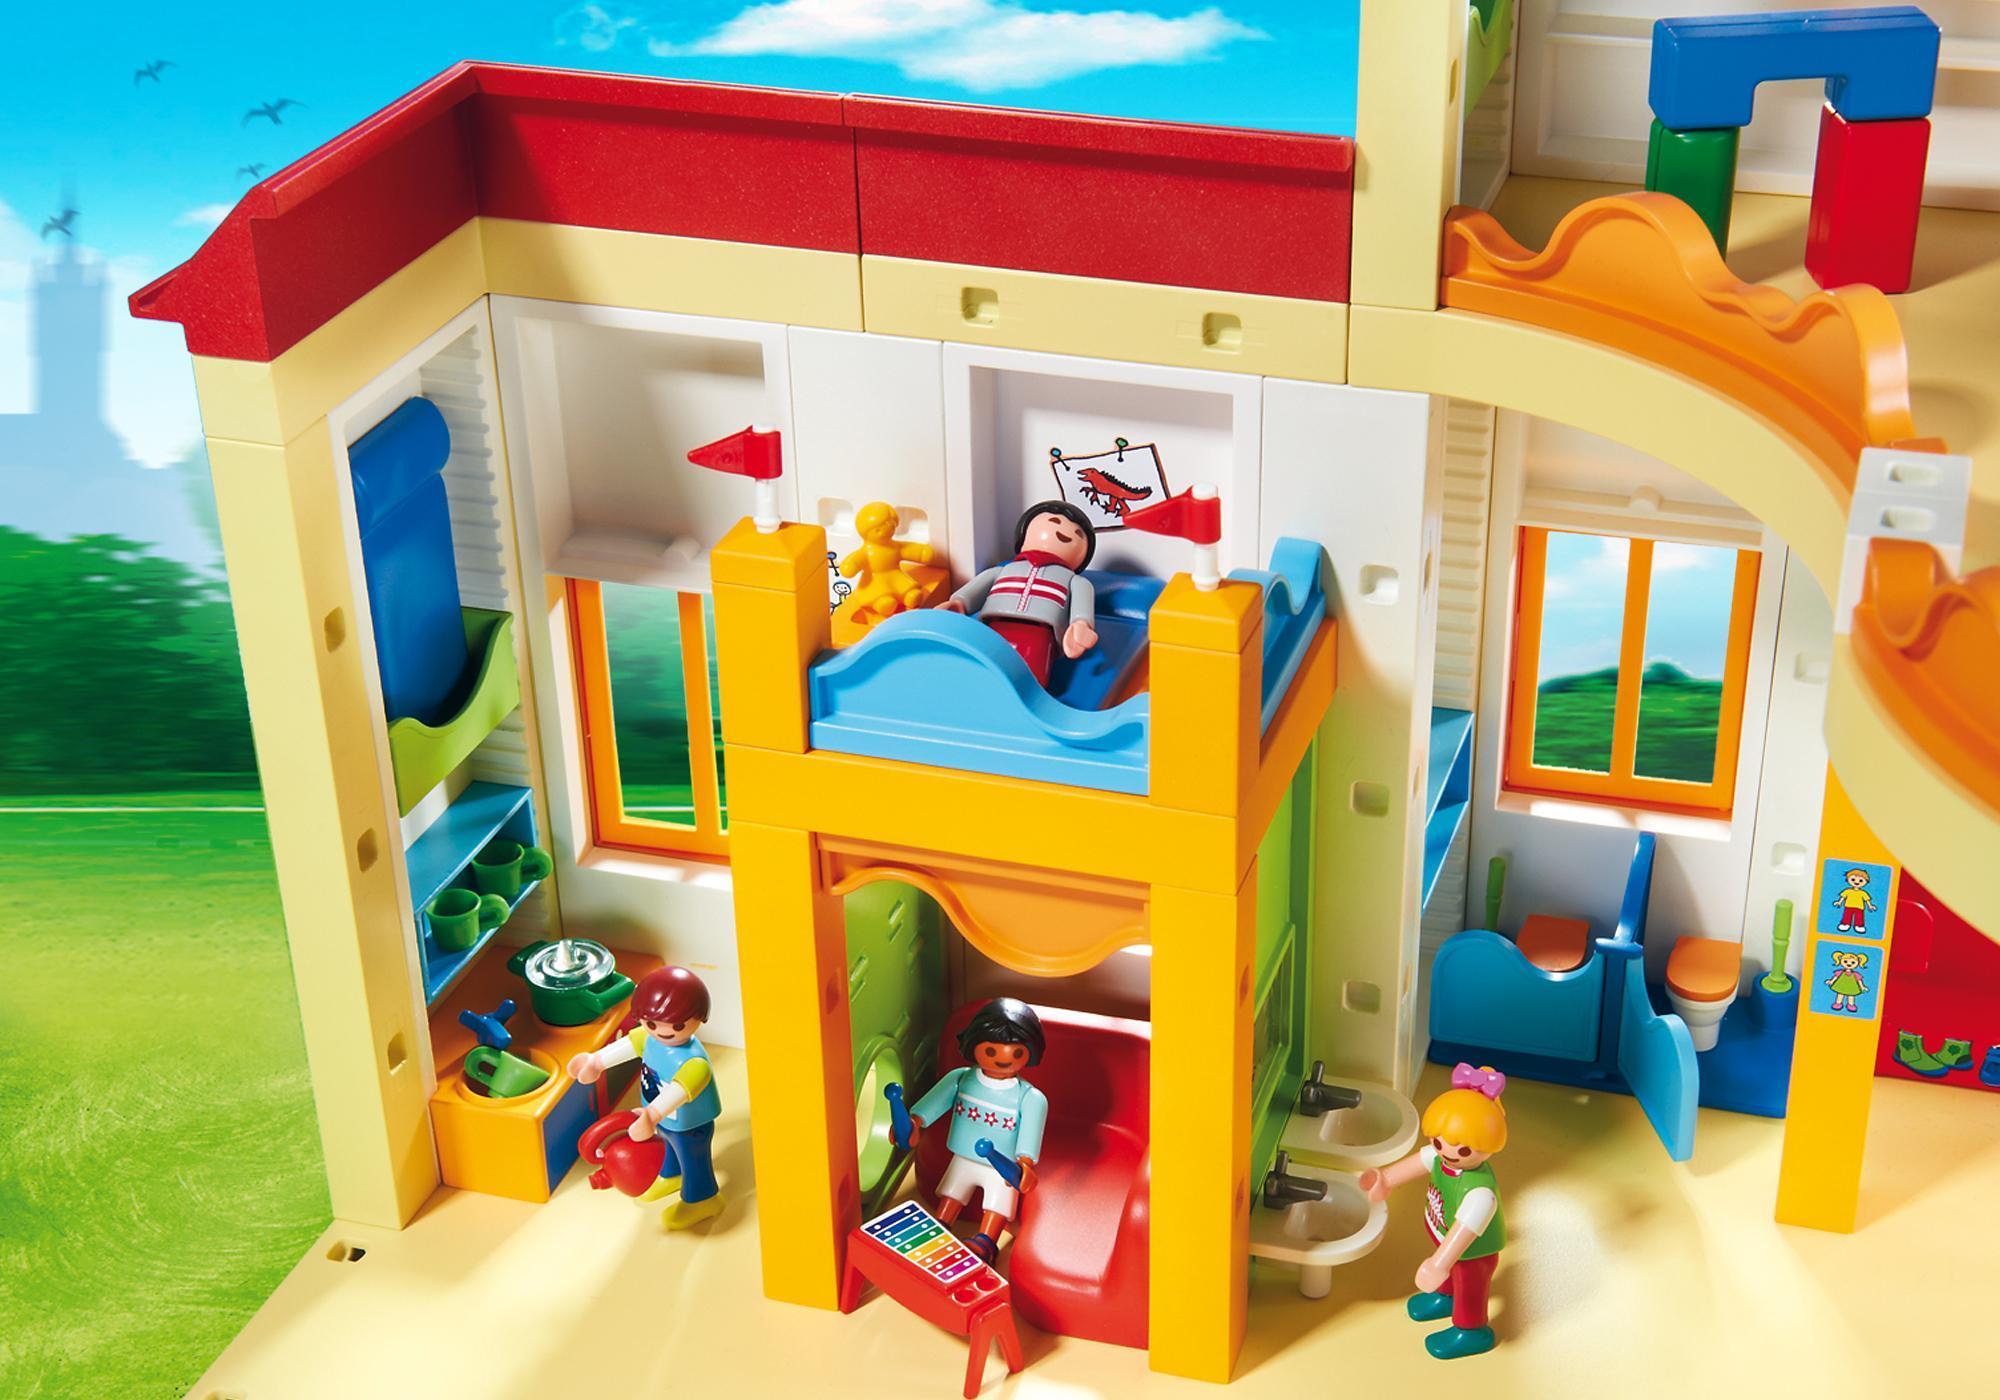 http://media.playmobil.com/i/playmobil/5567_product_extra3/KiTa Sonnenschein